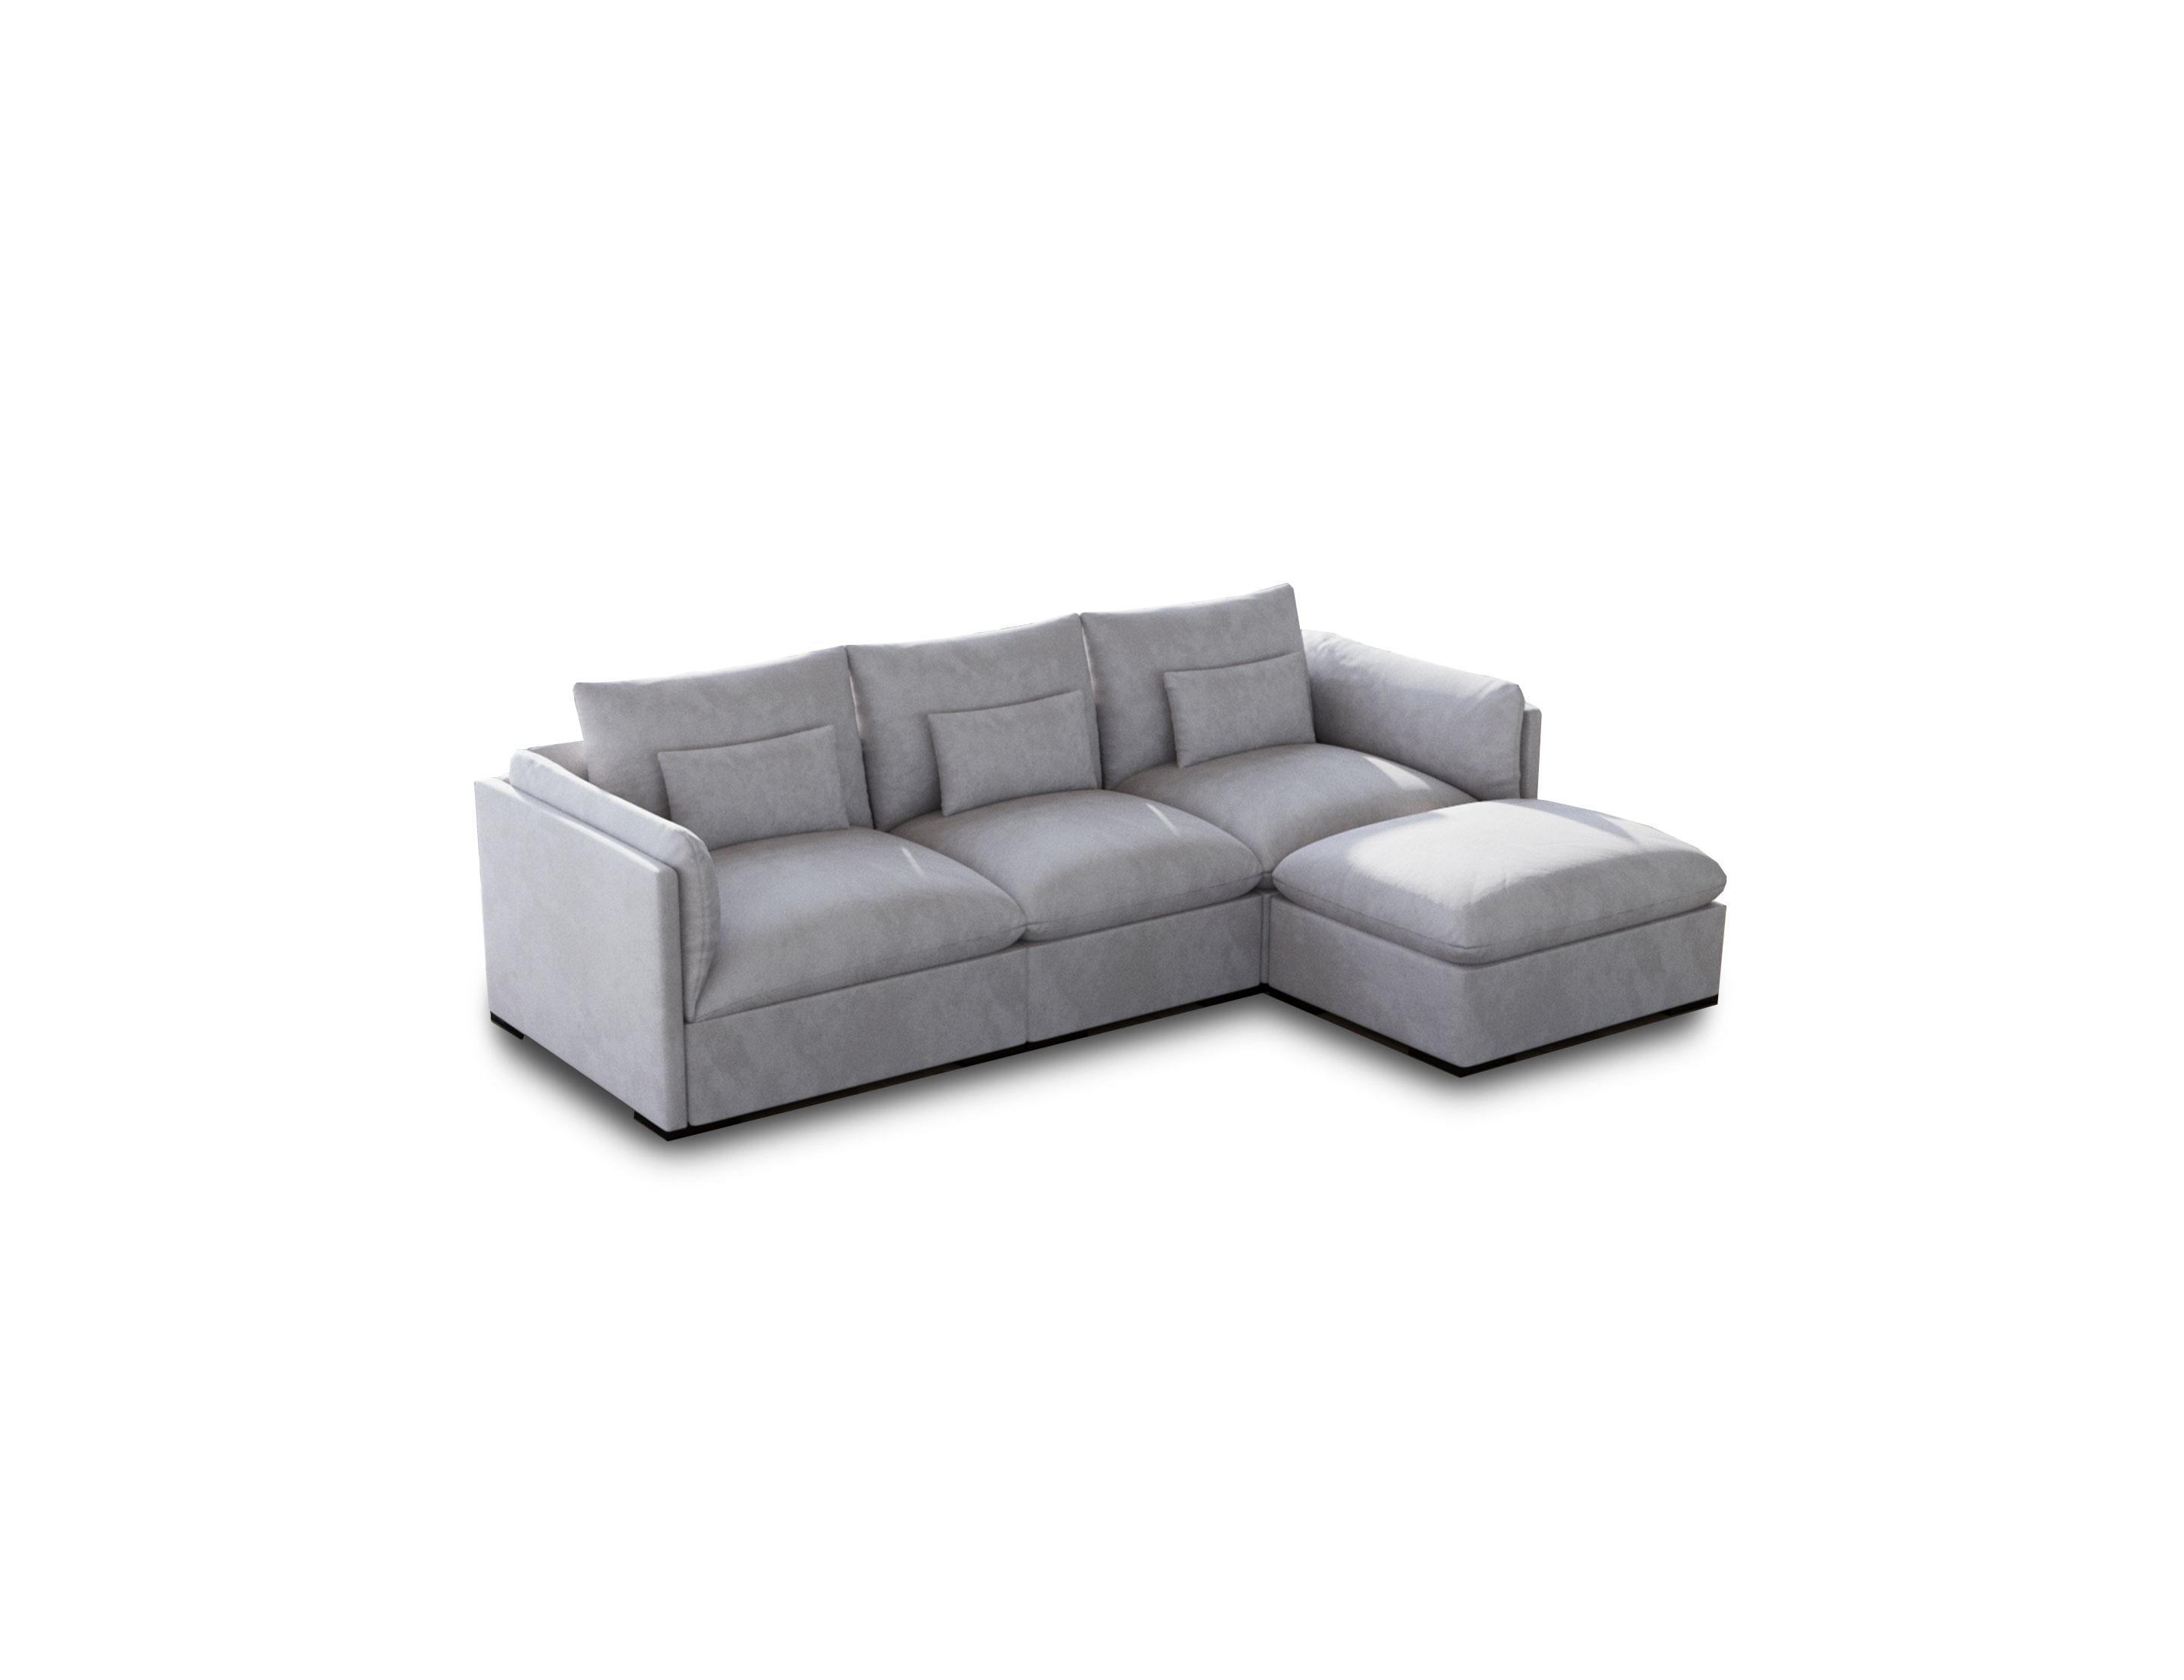 Adagio Luxury Sectional Modular Sofa